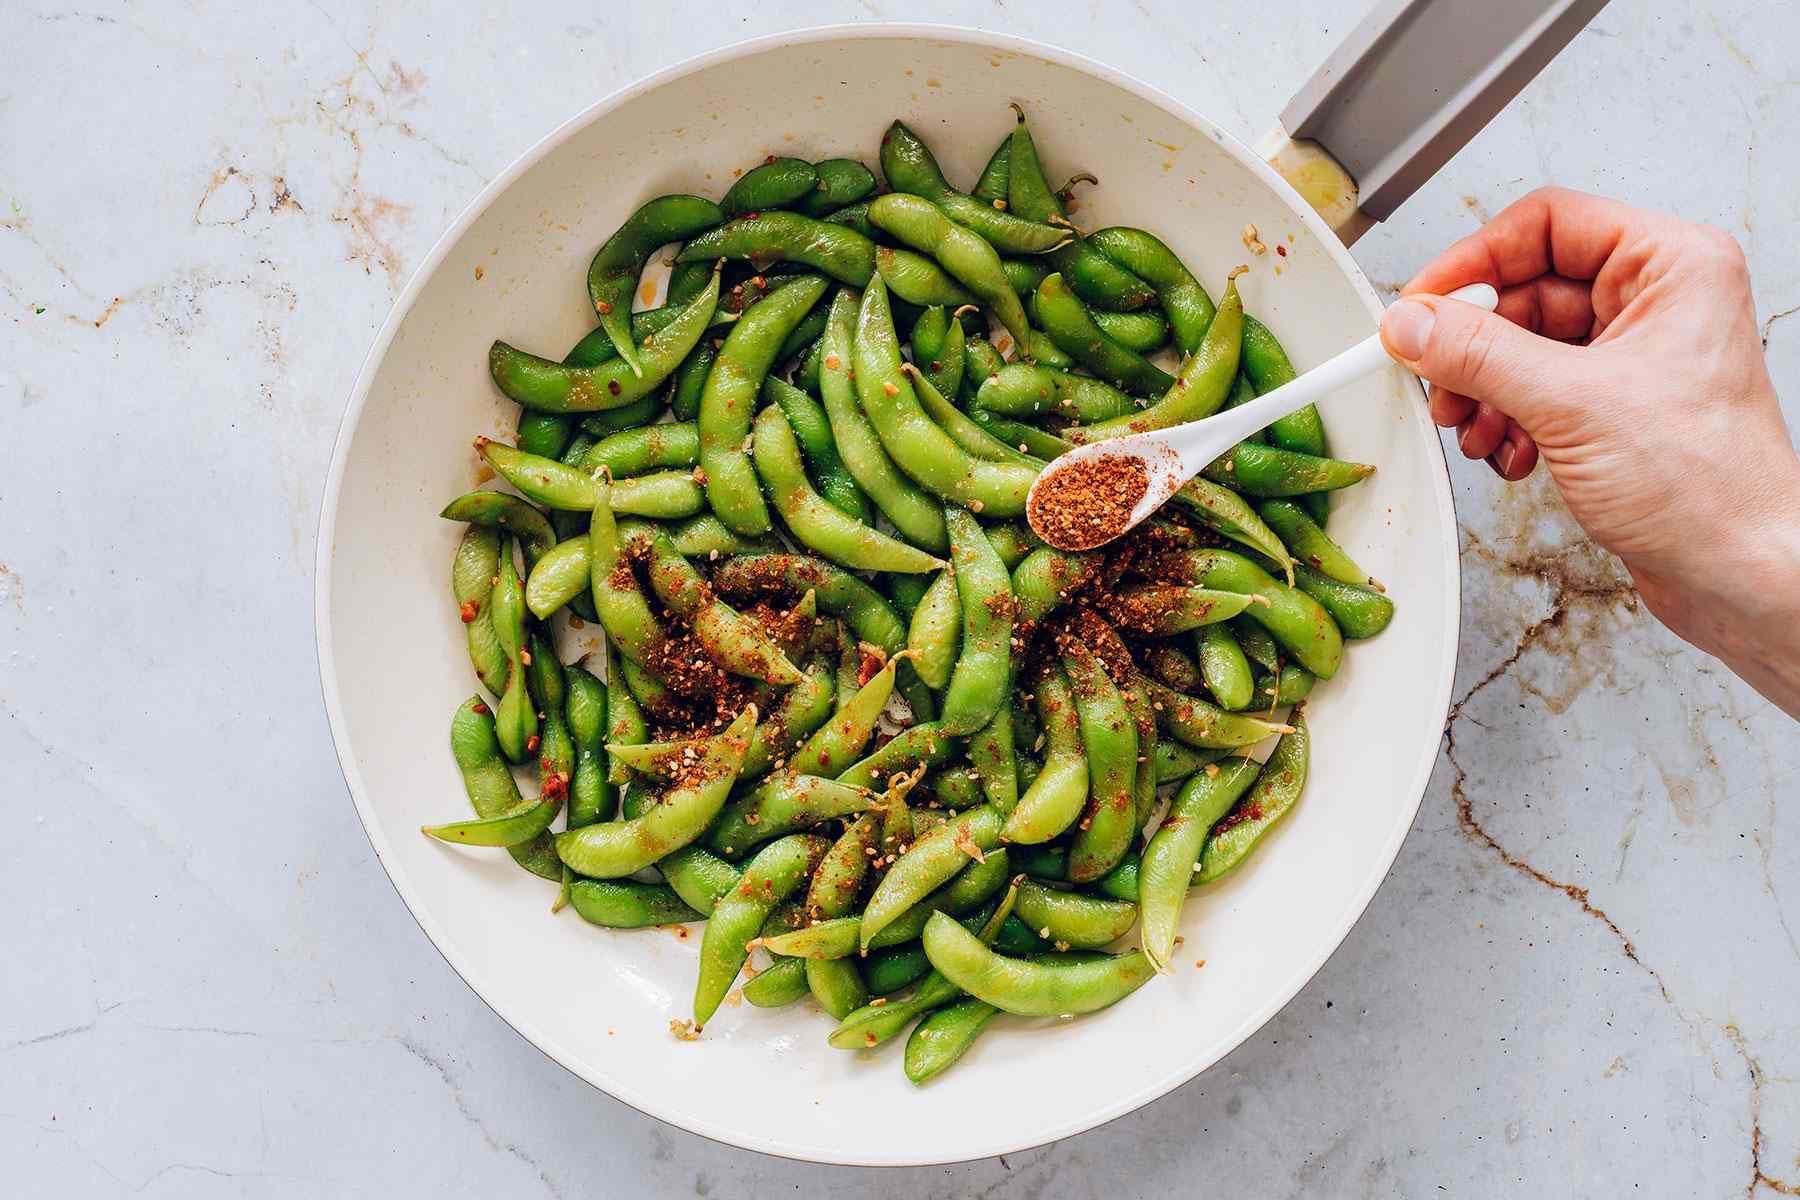 Add shichimi togarashi to the edamame mixture in the pan